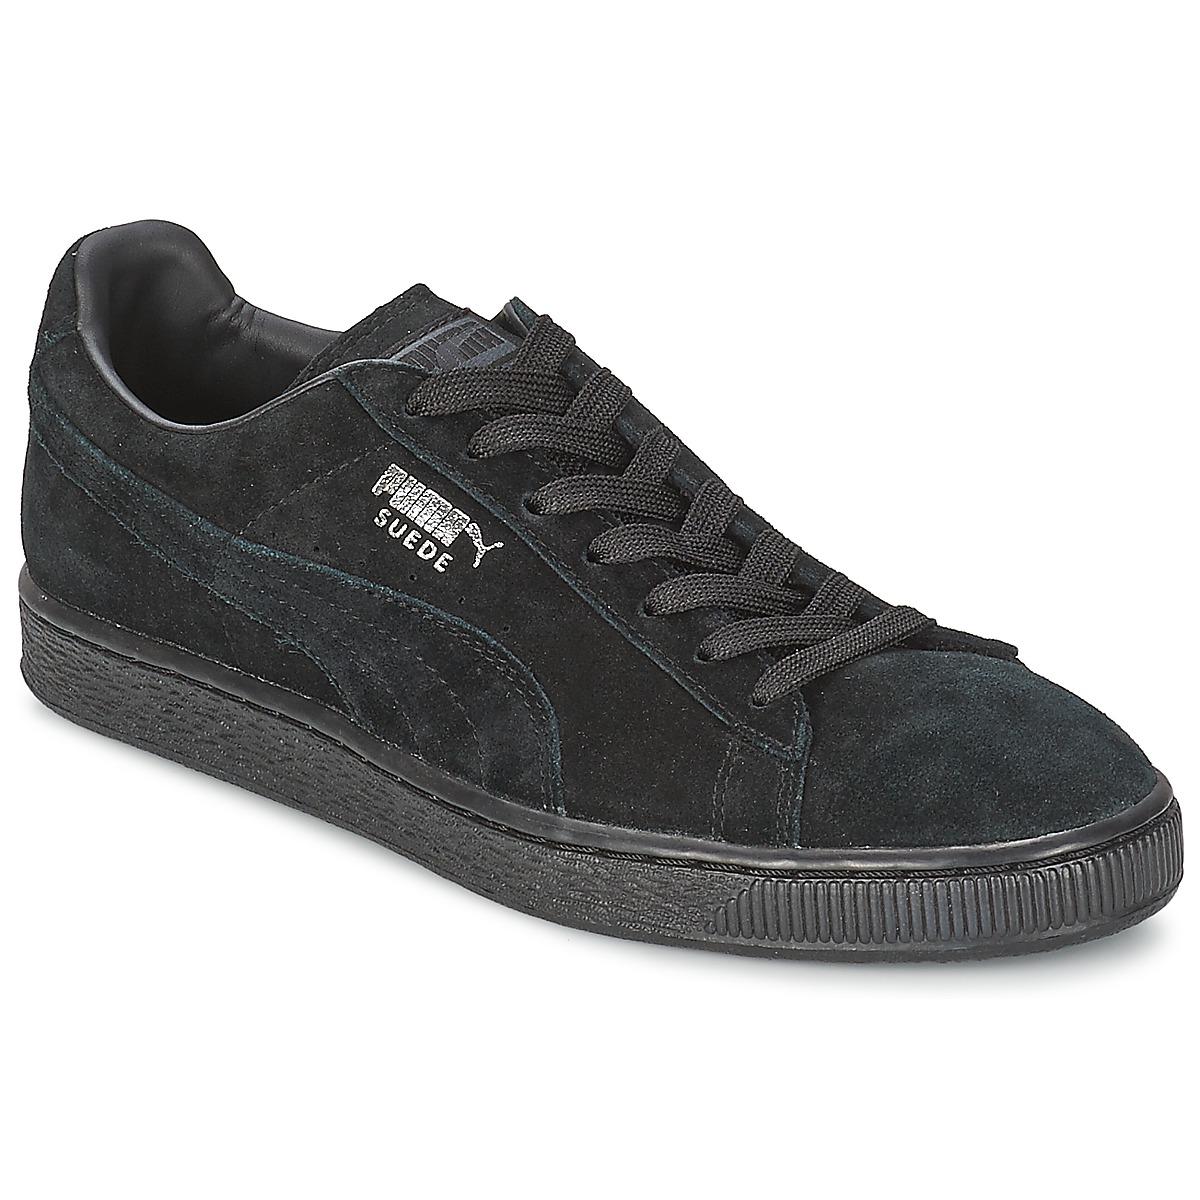 Puma SUEDE CLASSIC Black / Grey - Fast